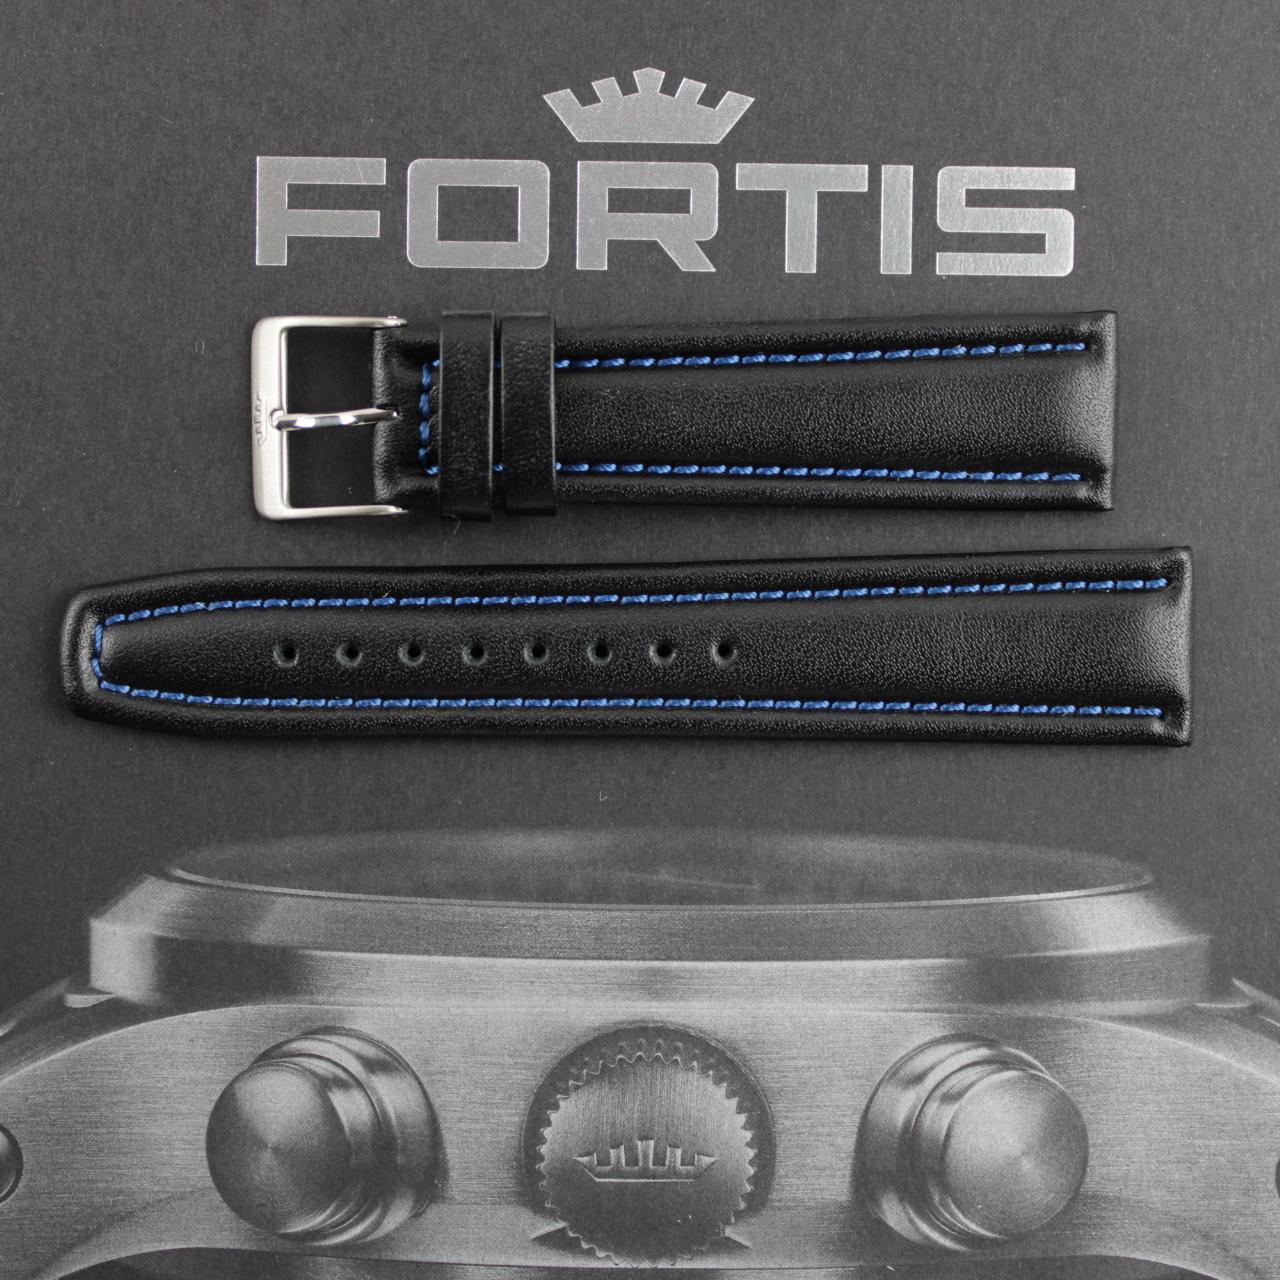 Fortis Lederband schwarz mit blauer Kontrastnaht.